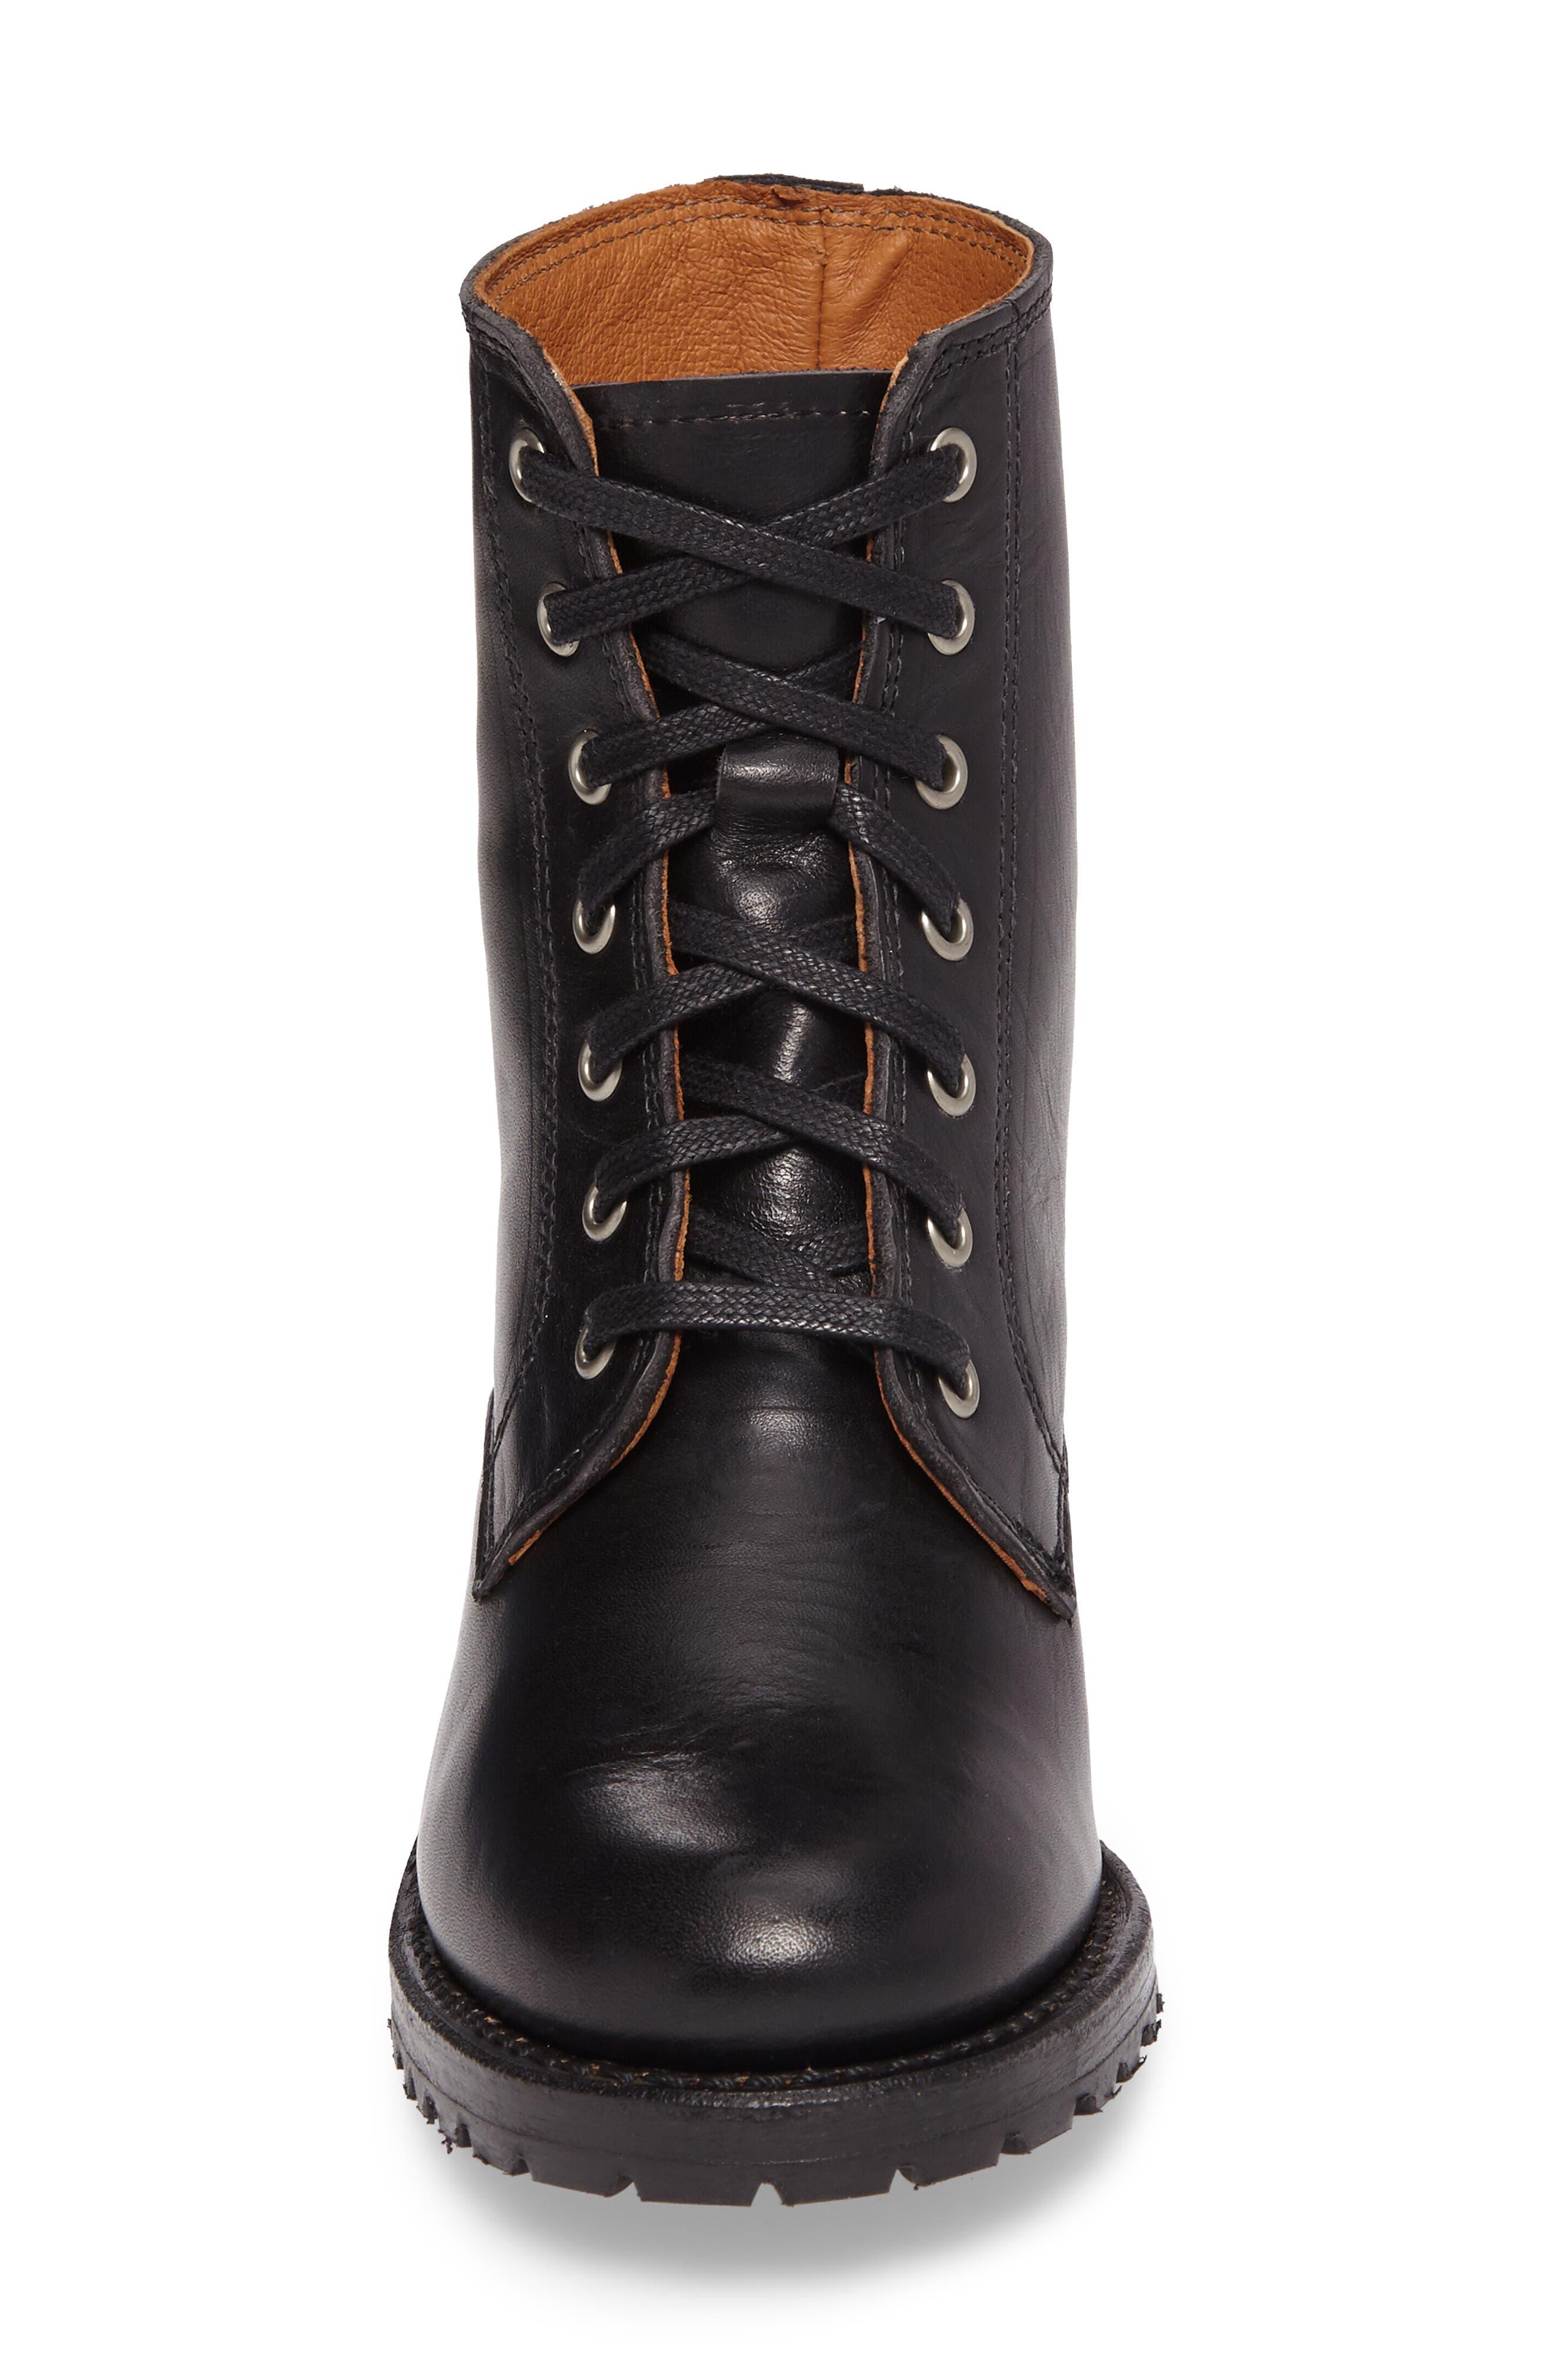 FRYE, Sabrina 6G Lace-Up Boot, Alternate thumbnail 4, color, BLACK